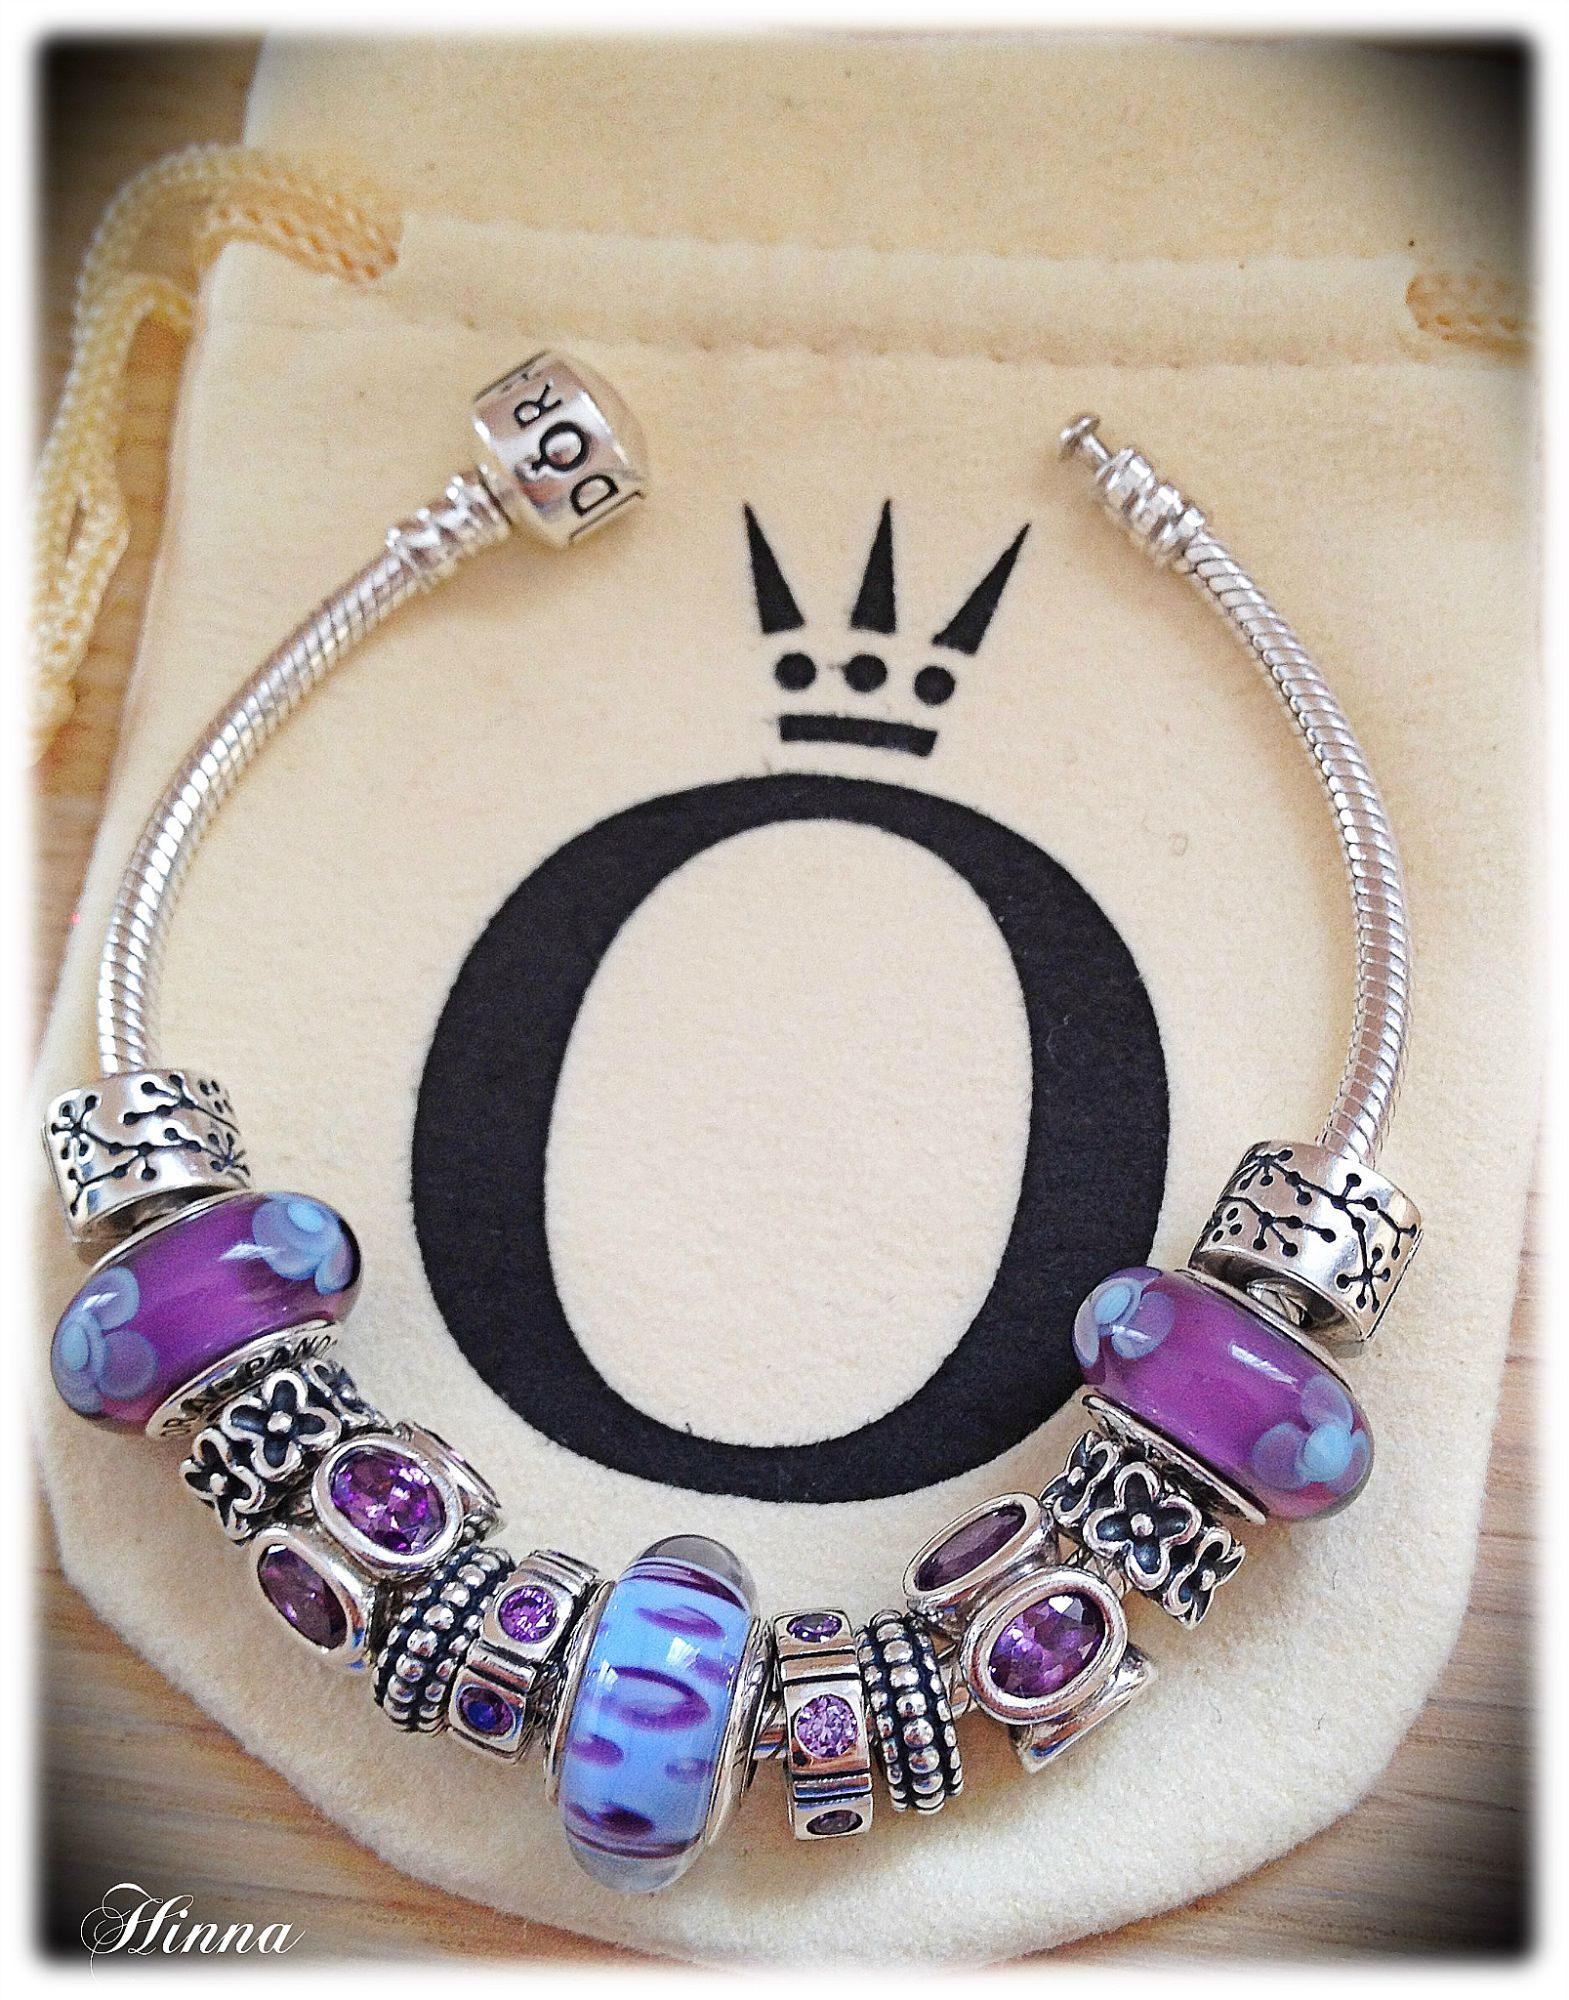 Pandora Genuine Pandora Jewelry Official Website Pandora Bracelet Designs Pandora Bracelets Pandora Bracelet Charms